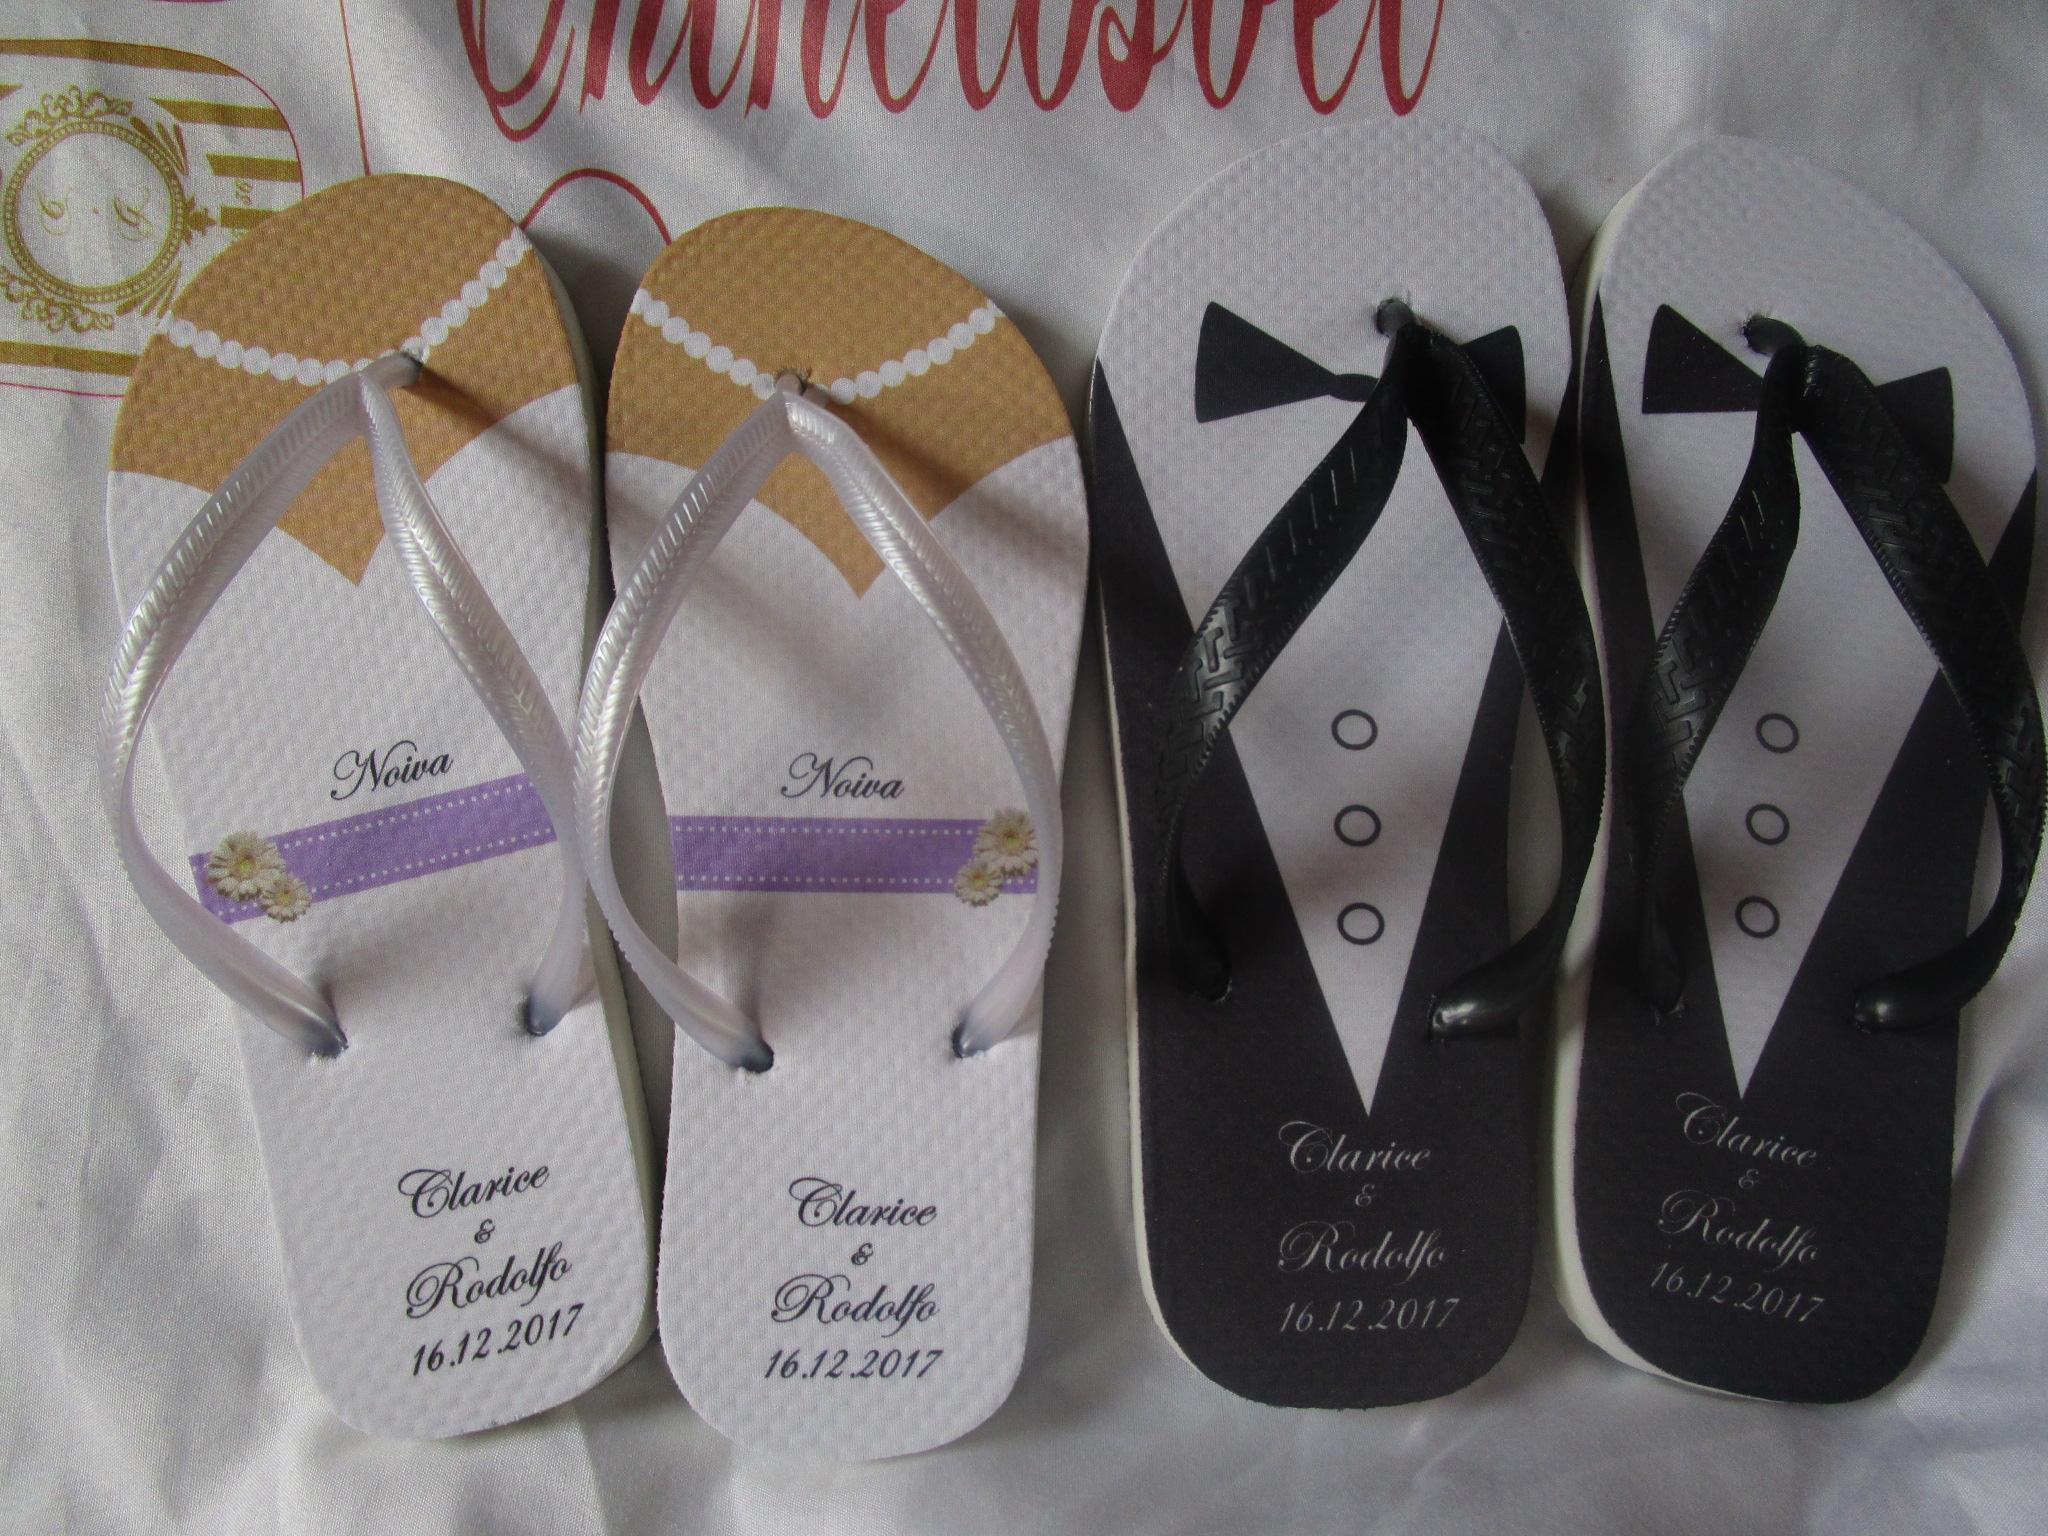 bf361c67814c00 chinelos personalizados para padrinhos